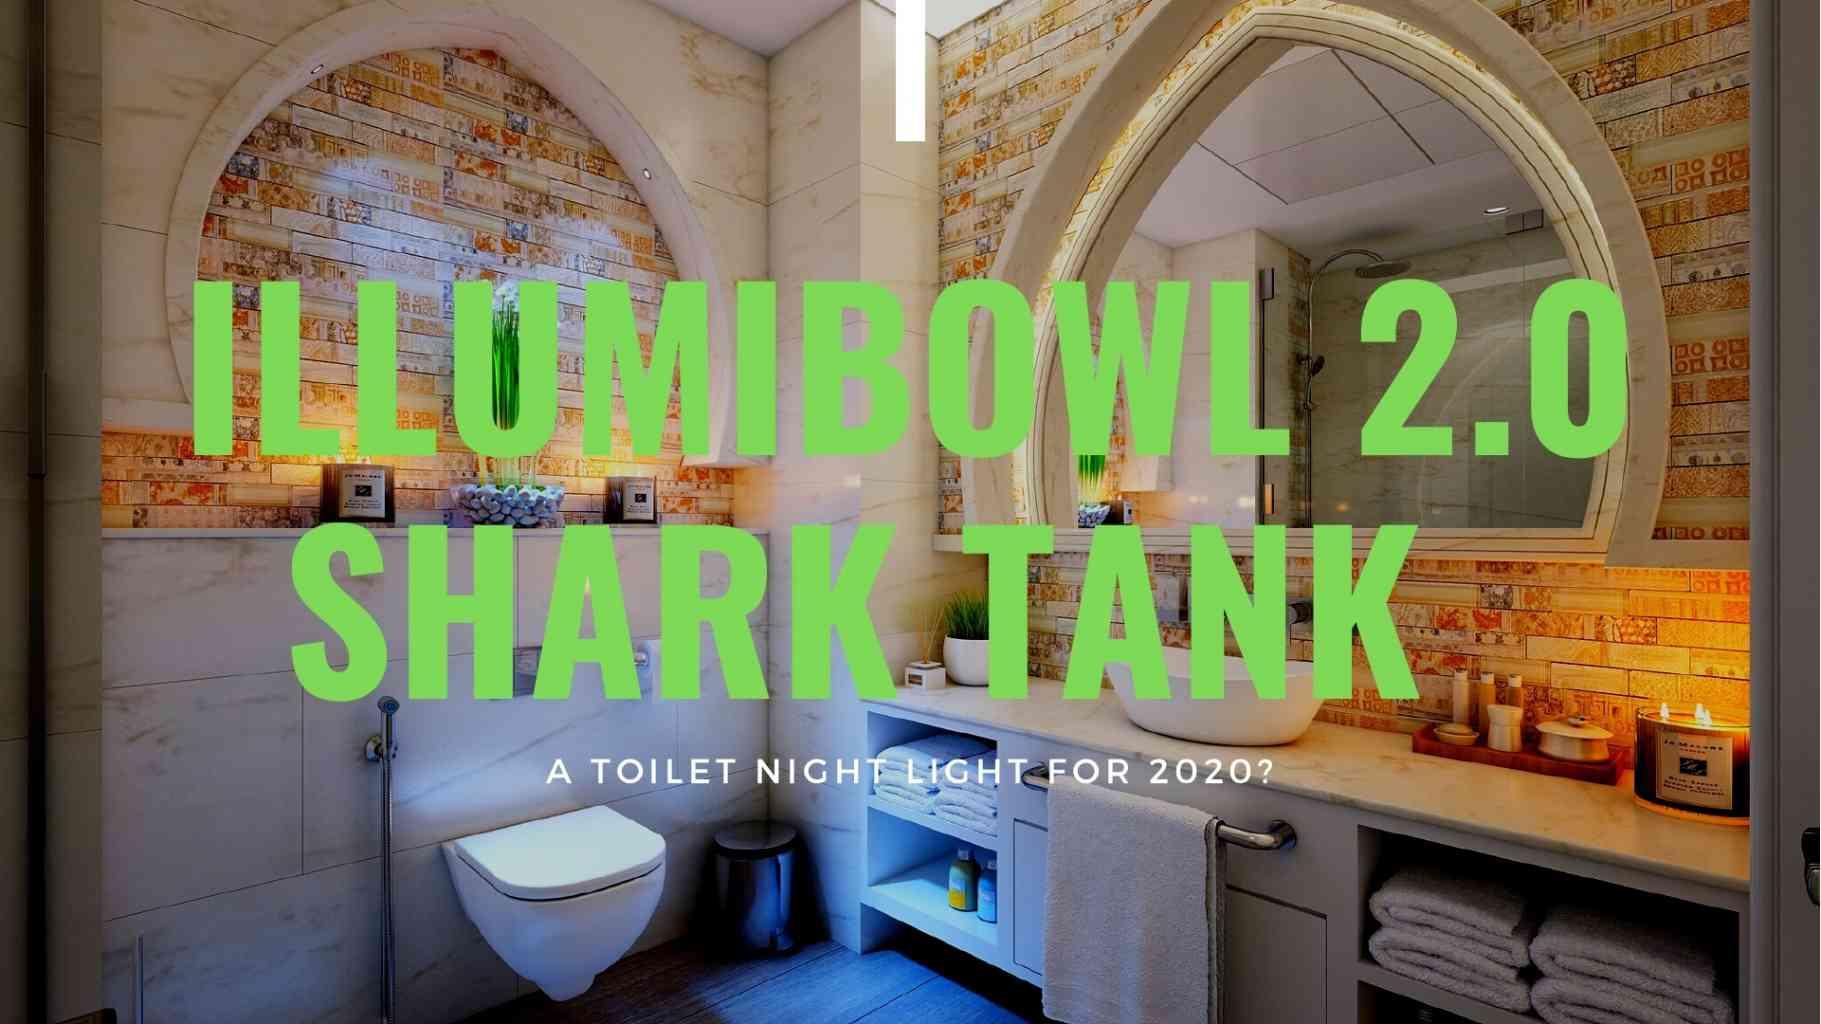 Illumibowl 2.0 Shark Tank – A toilet night light for 2020?